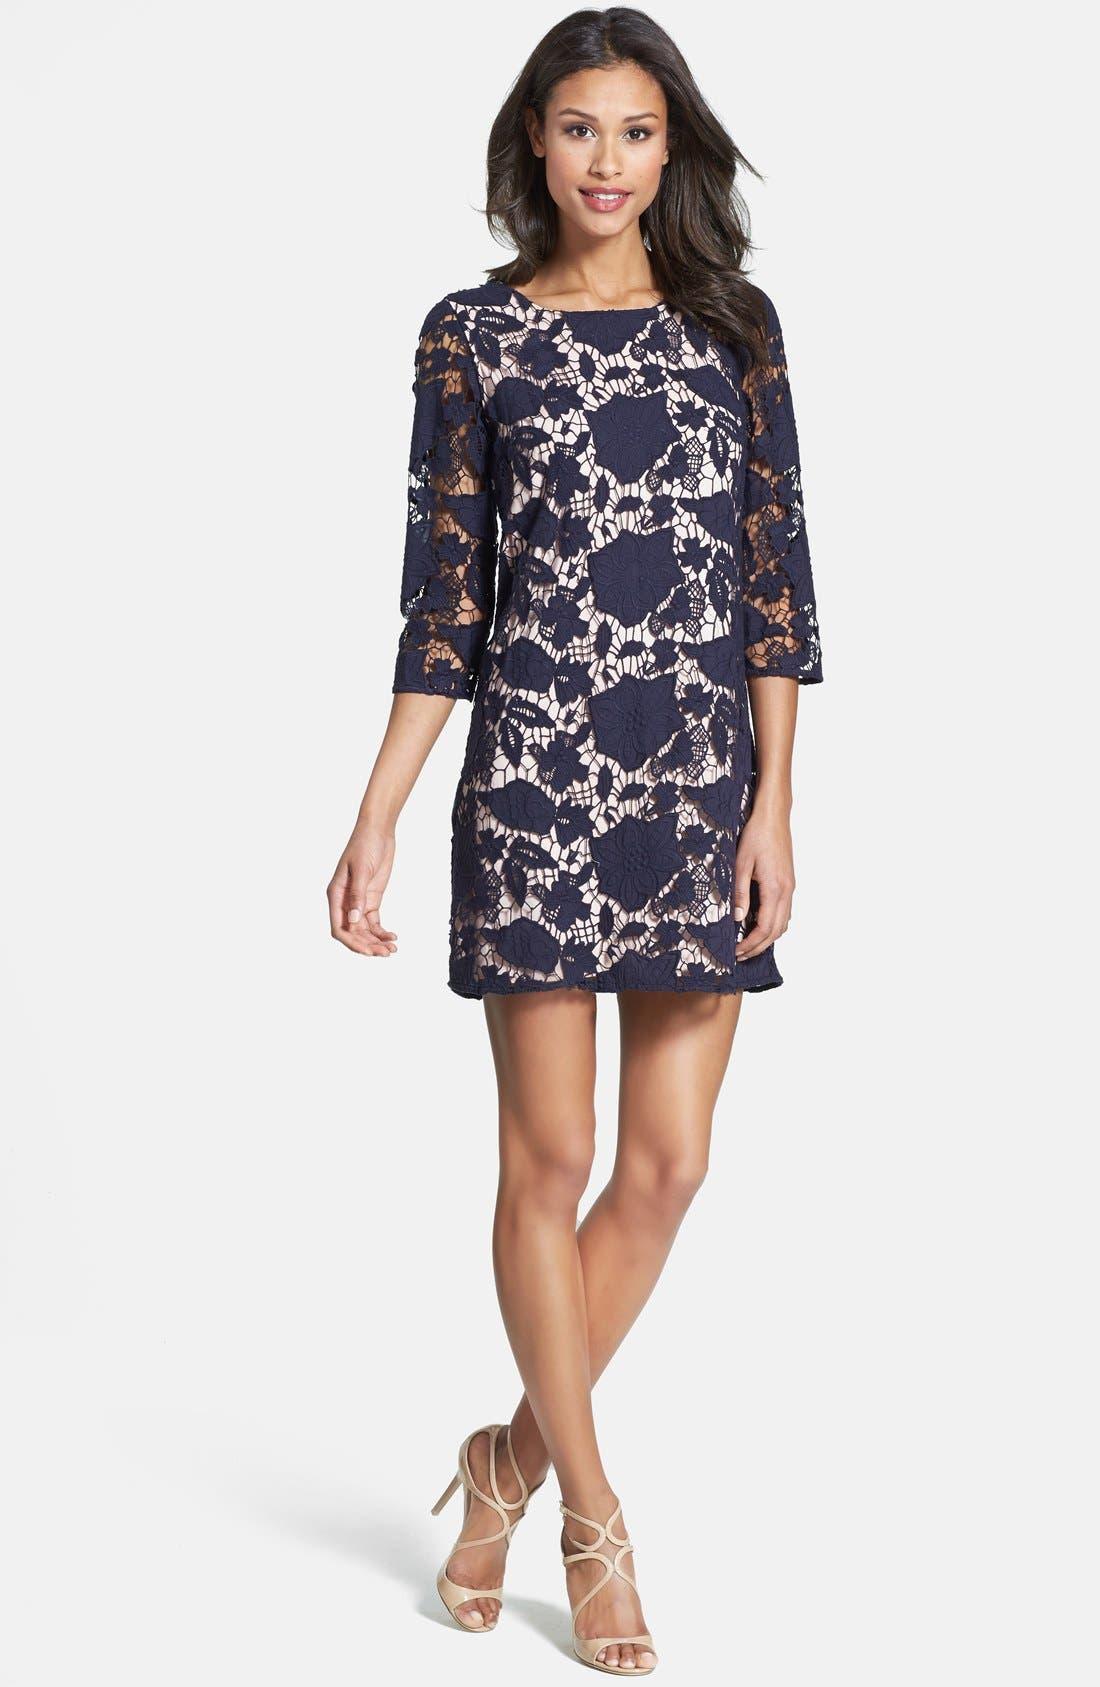 Alternate Image 1 Selected - ERIN erin fetherston 'Amaryllis' Floral Lace Shift Dress